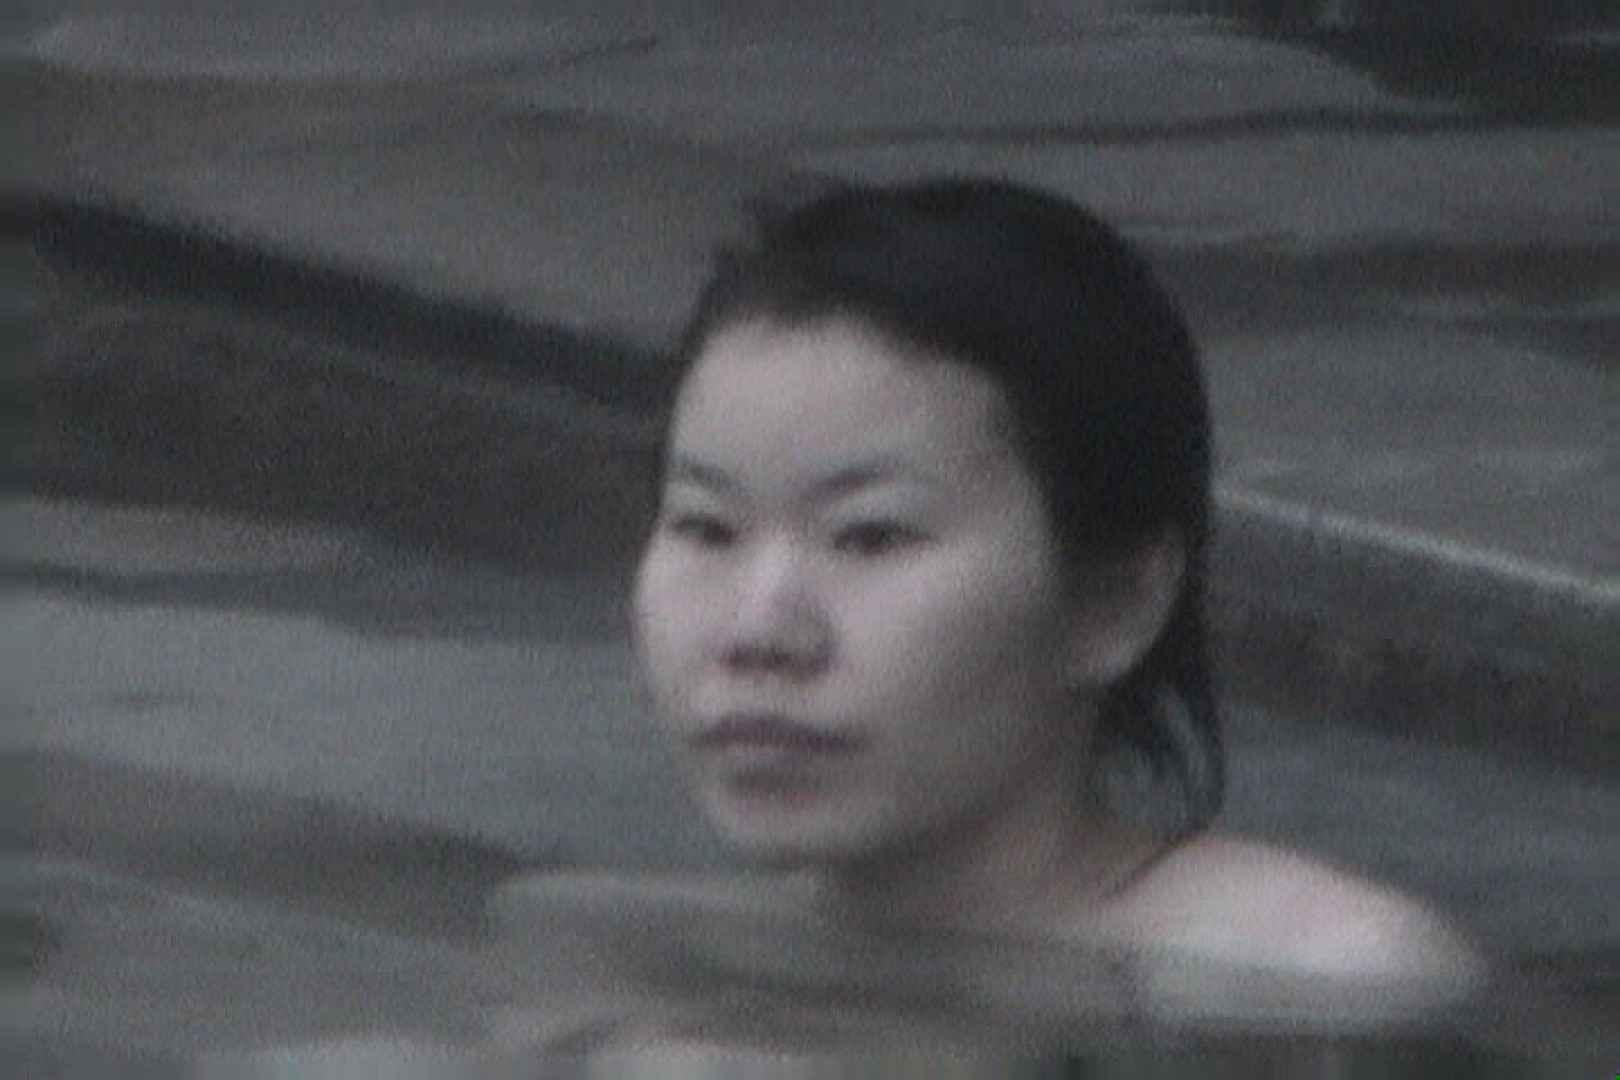 Aquaな露天風呂Vol.556 露天風呂突入 | 盗撮師作品  69pic 7